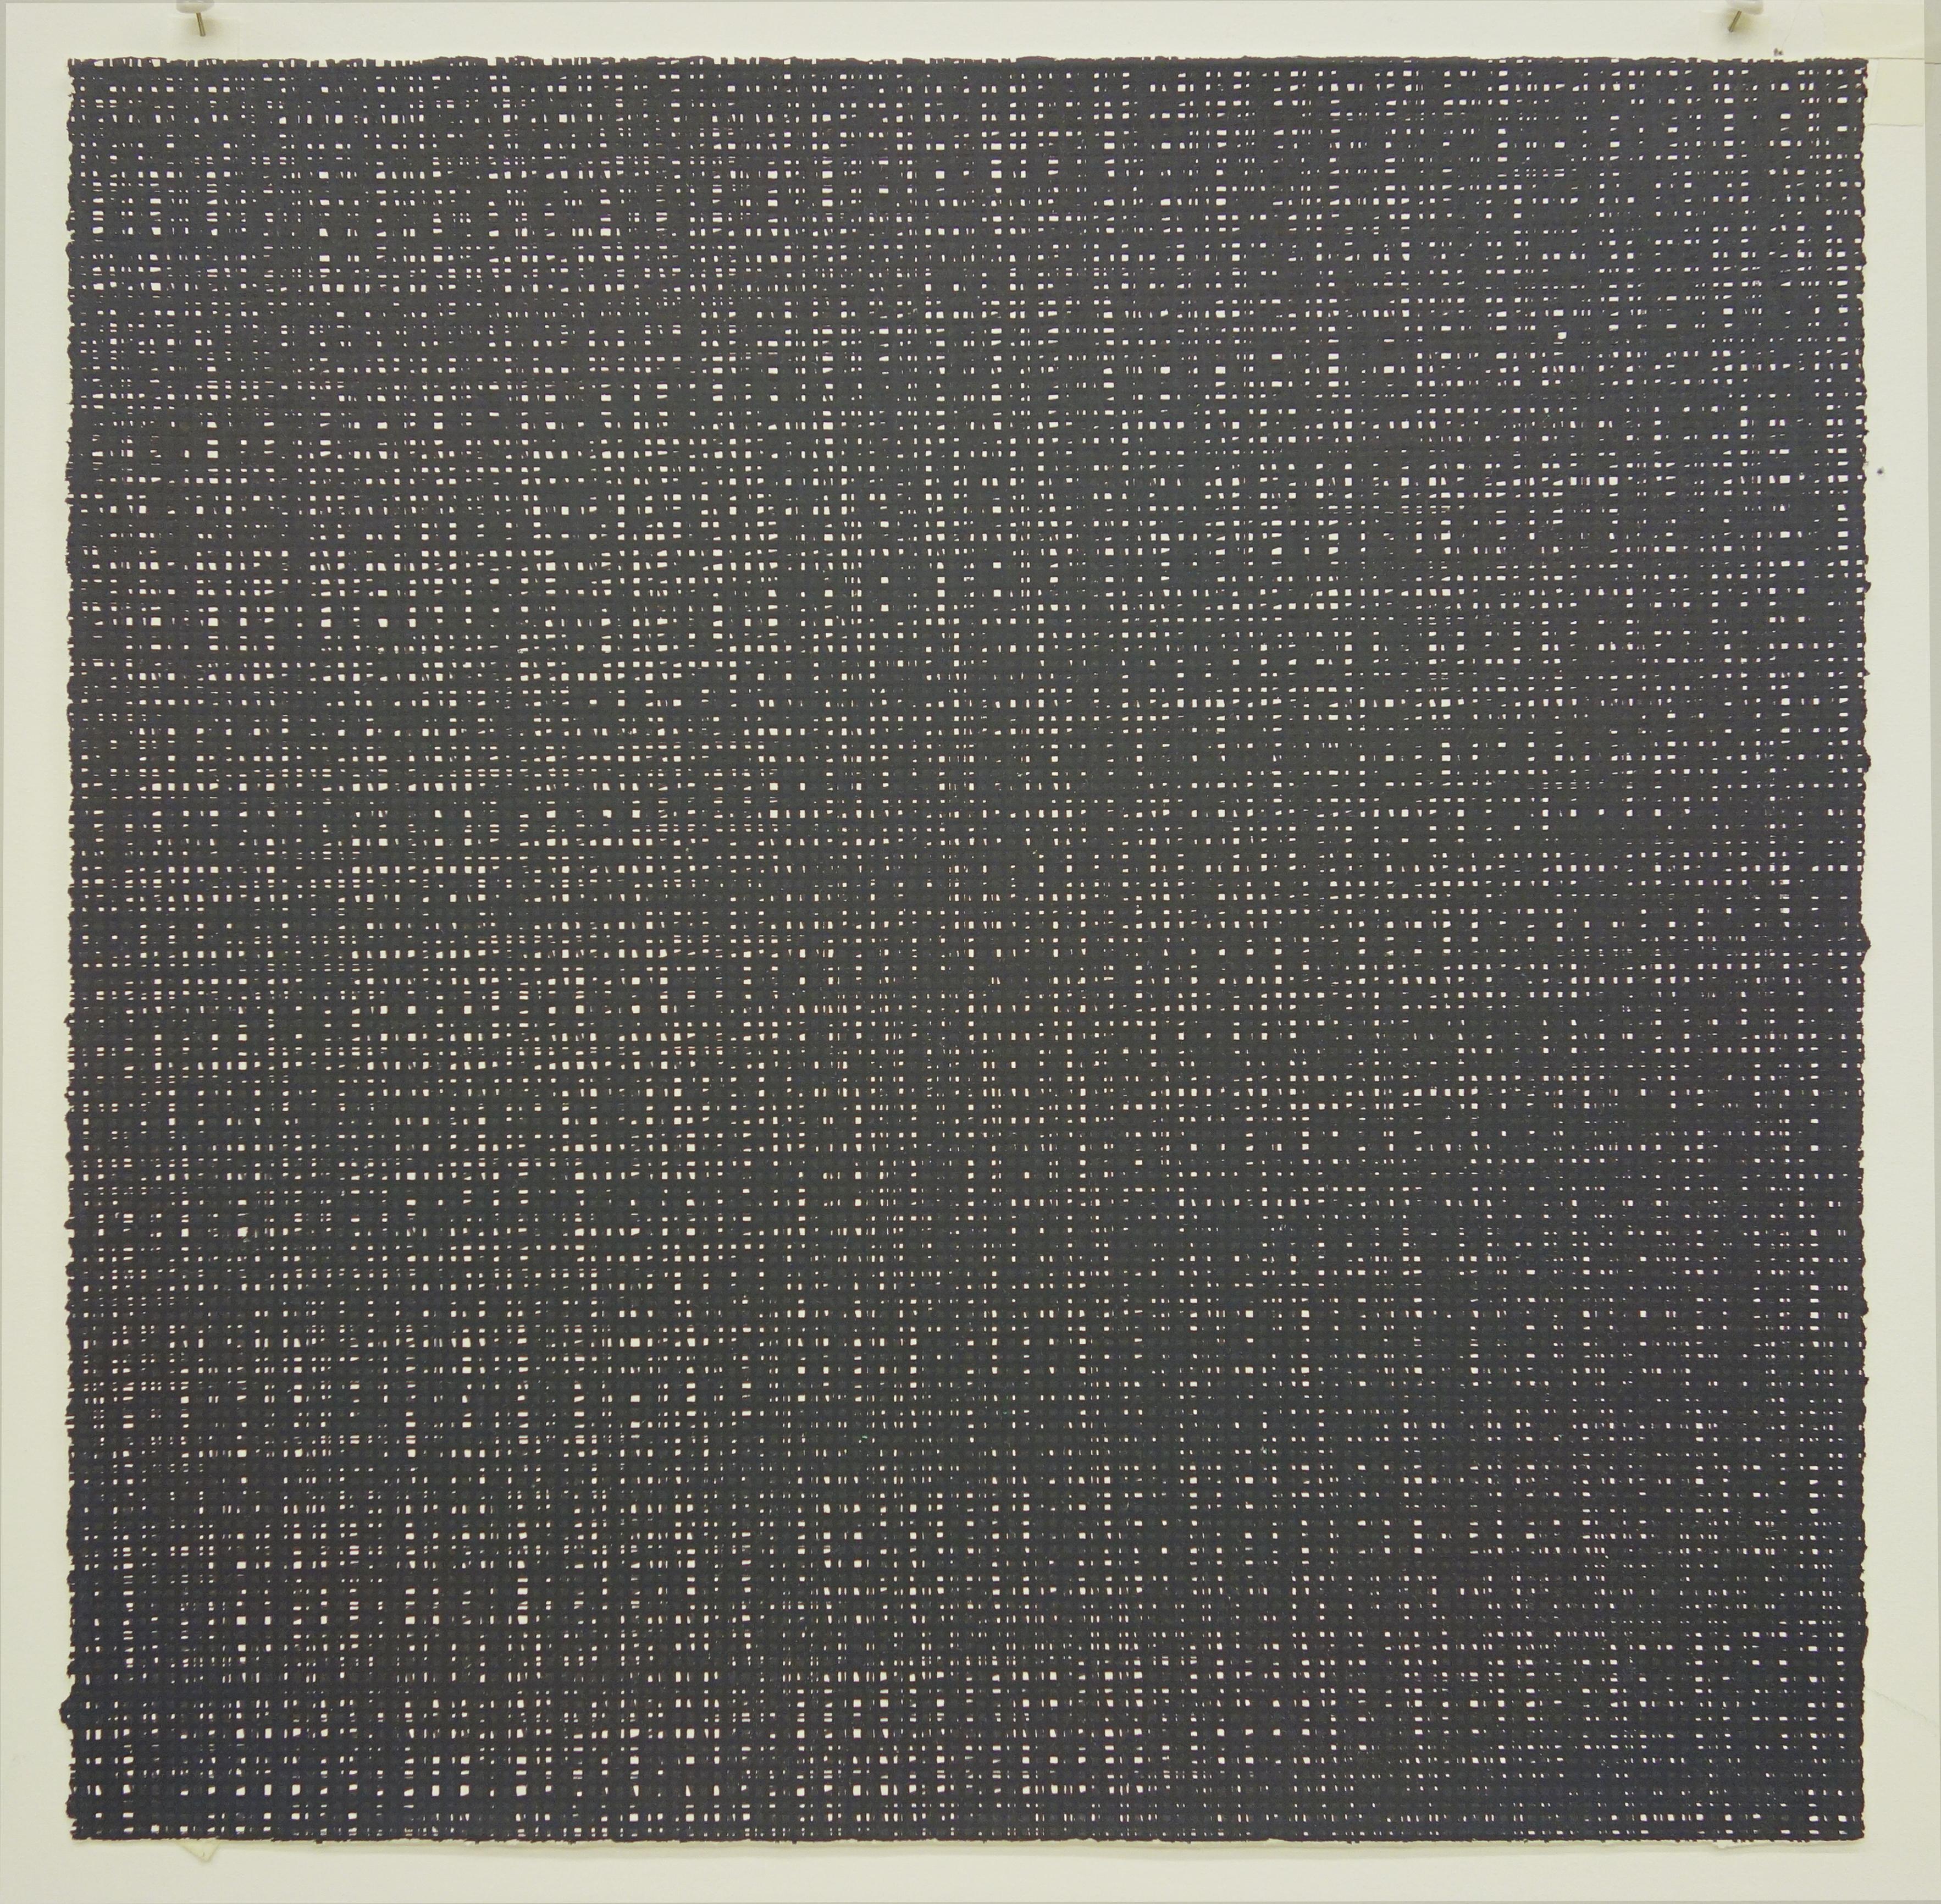 Rob de Oude, Untitled-Wassaic 5, 2016, silkscreen, 18 x 18 inches, Suite of 10